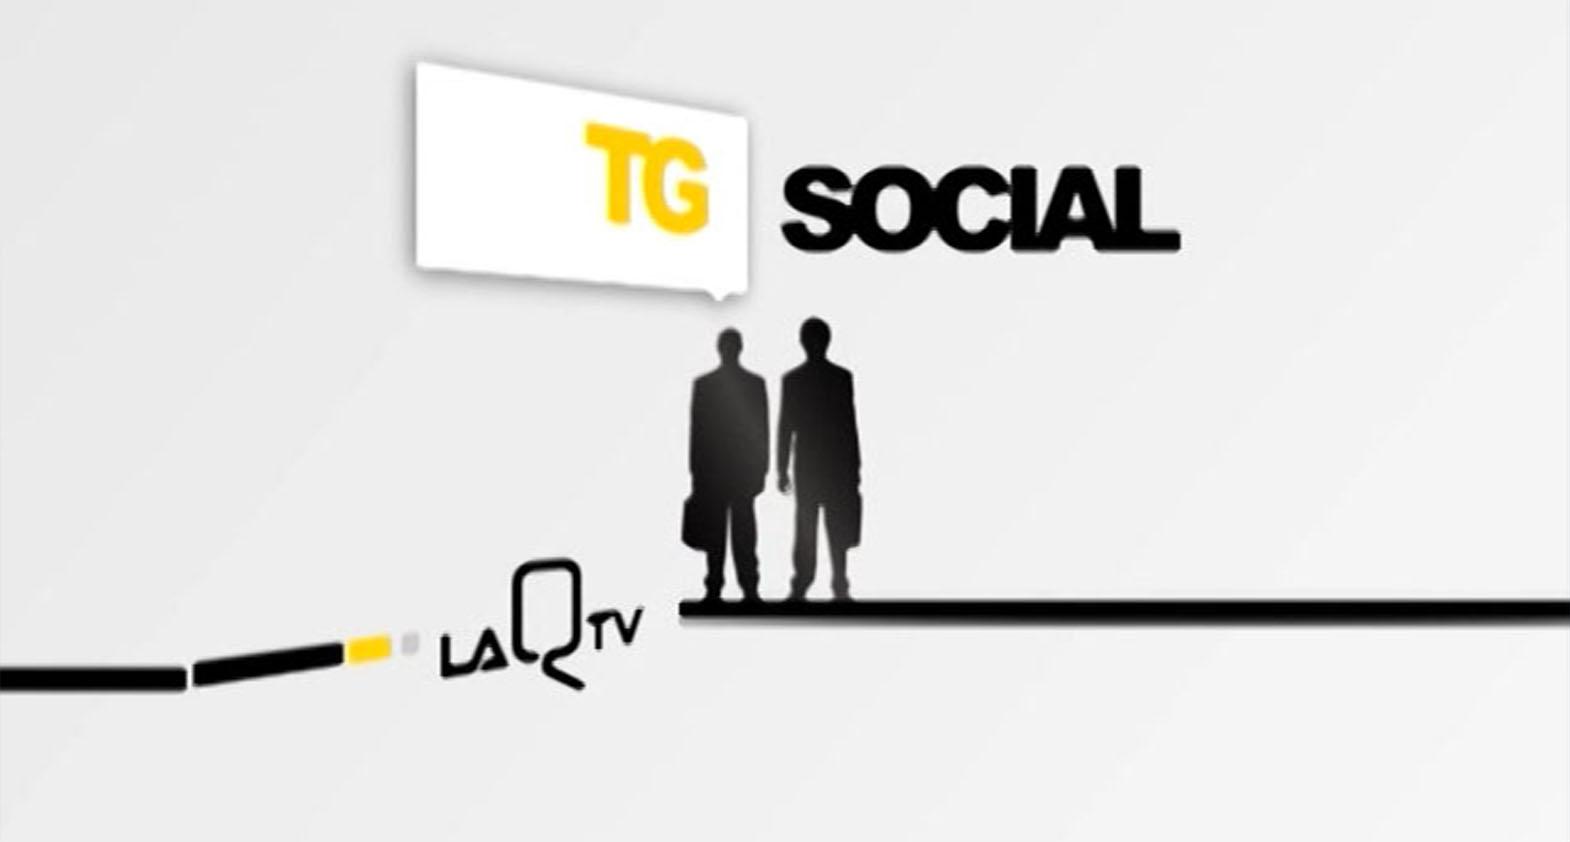 TG SOCIAL